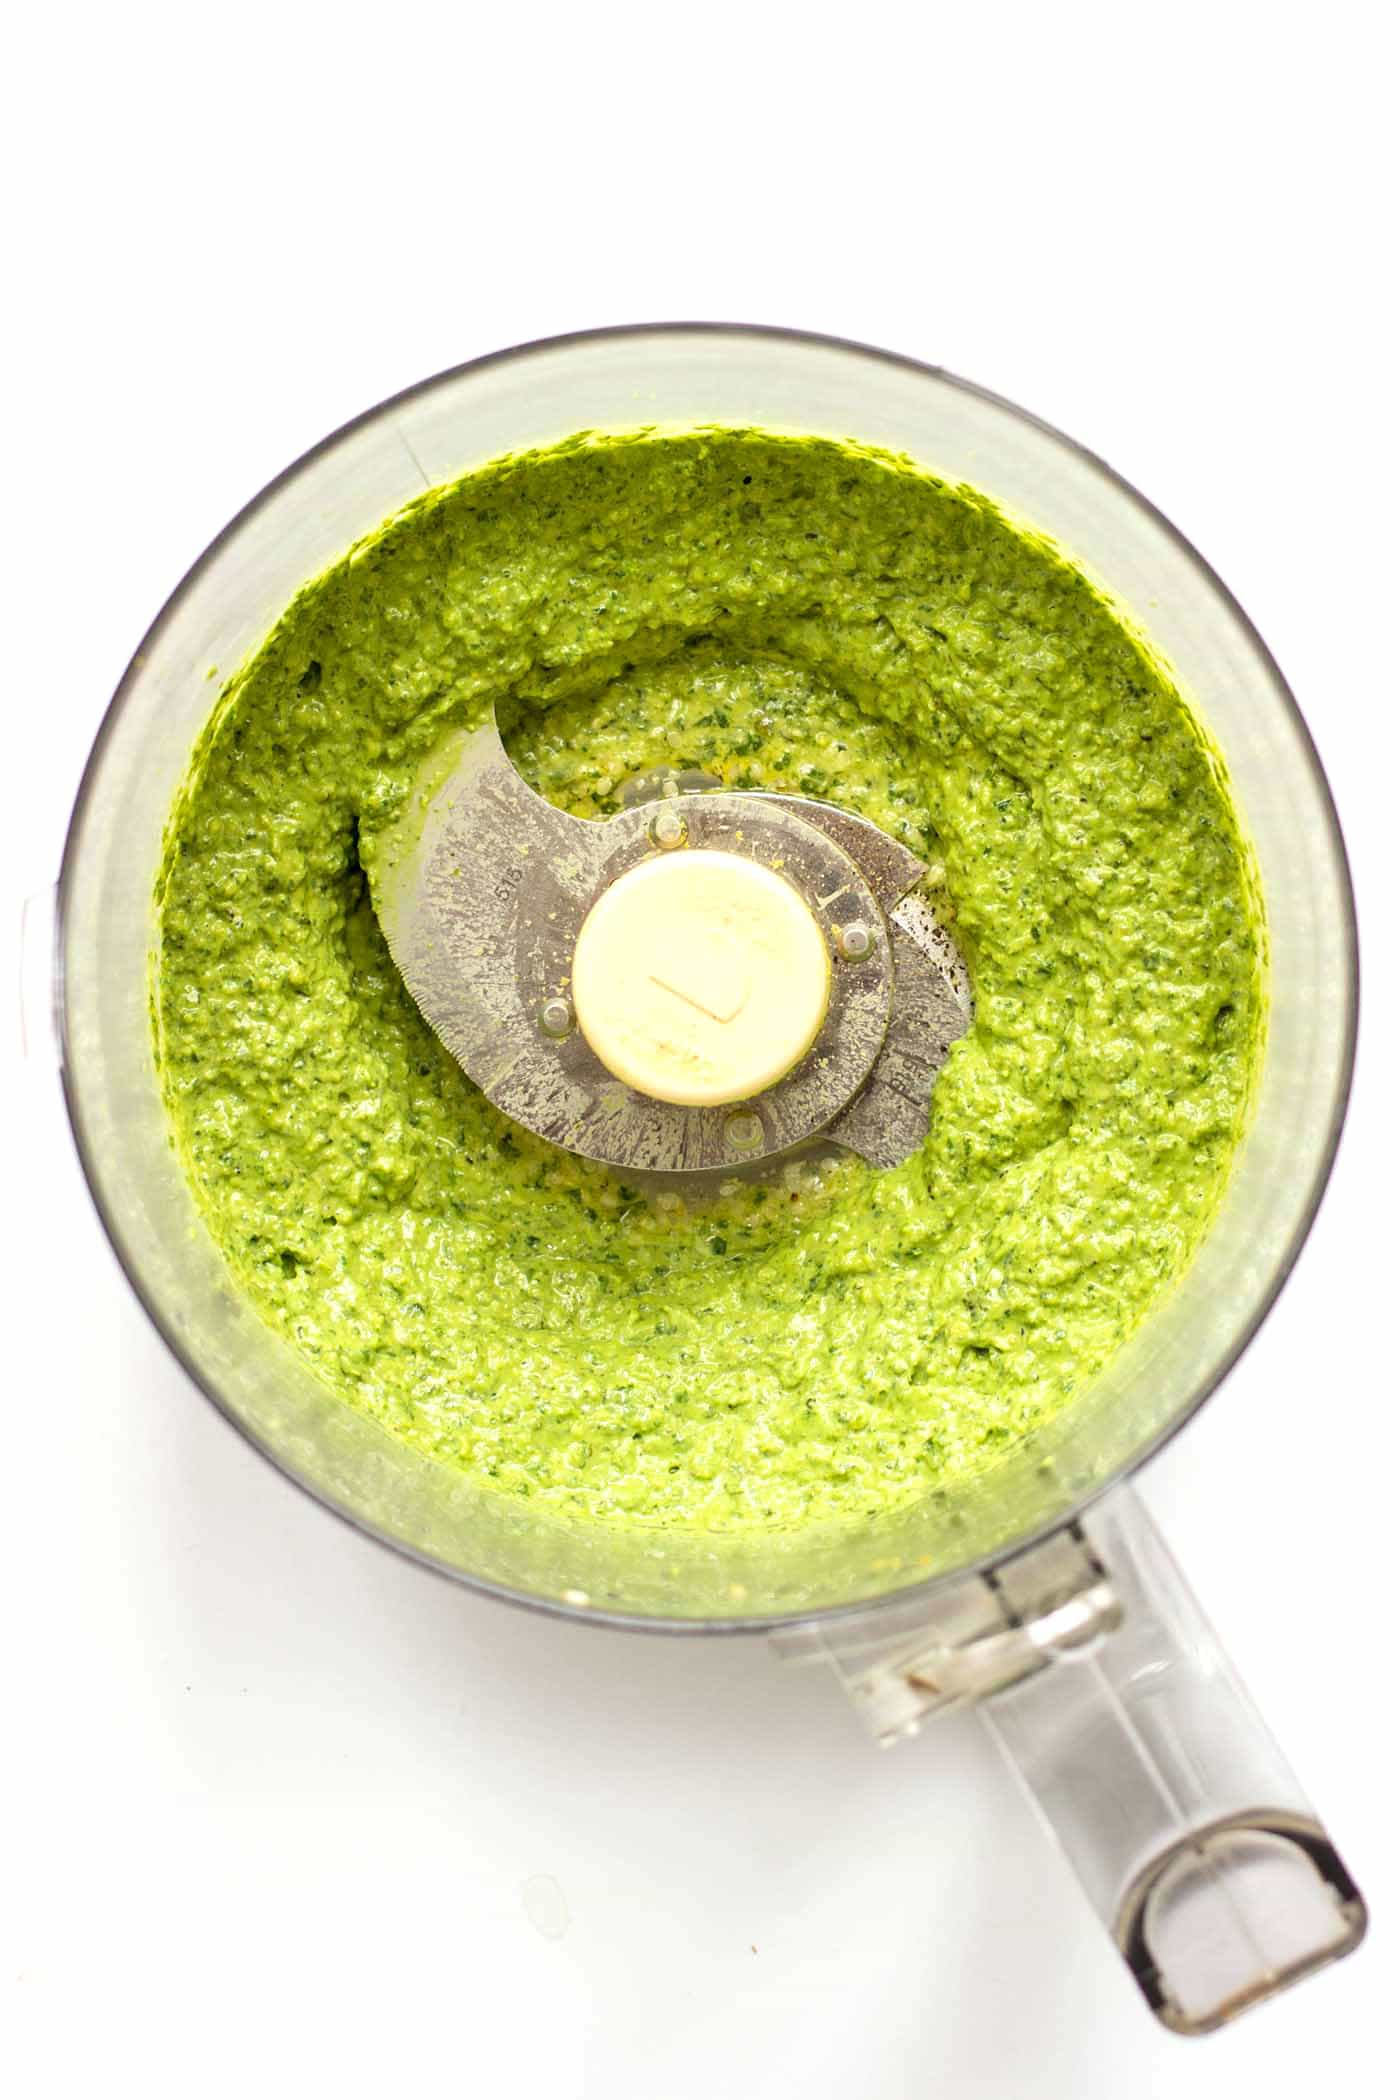 VEGAN HEMP SEED PESTO! Learn how to make this healthy and easy pesto using hemp seeds and avocado!